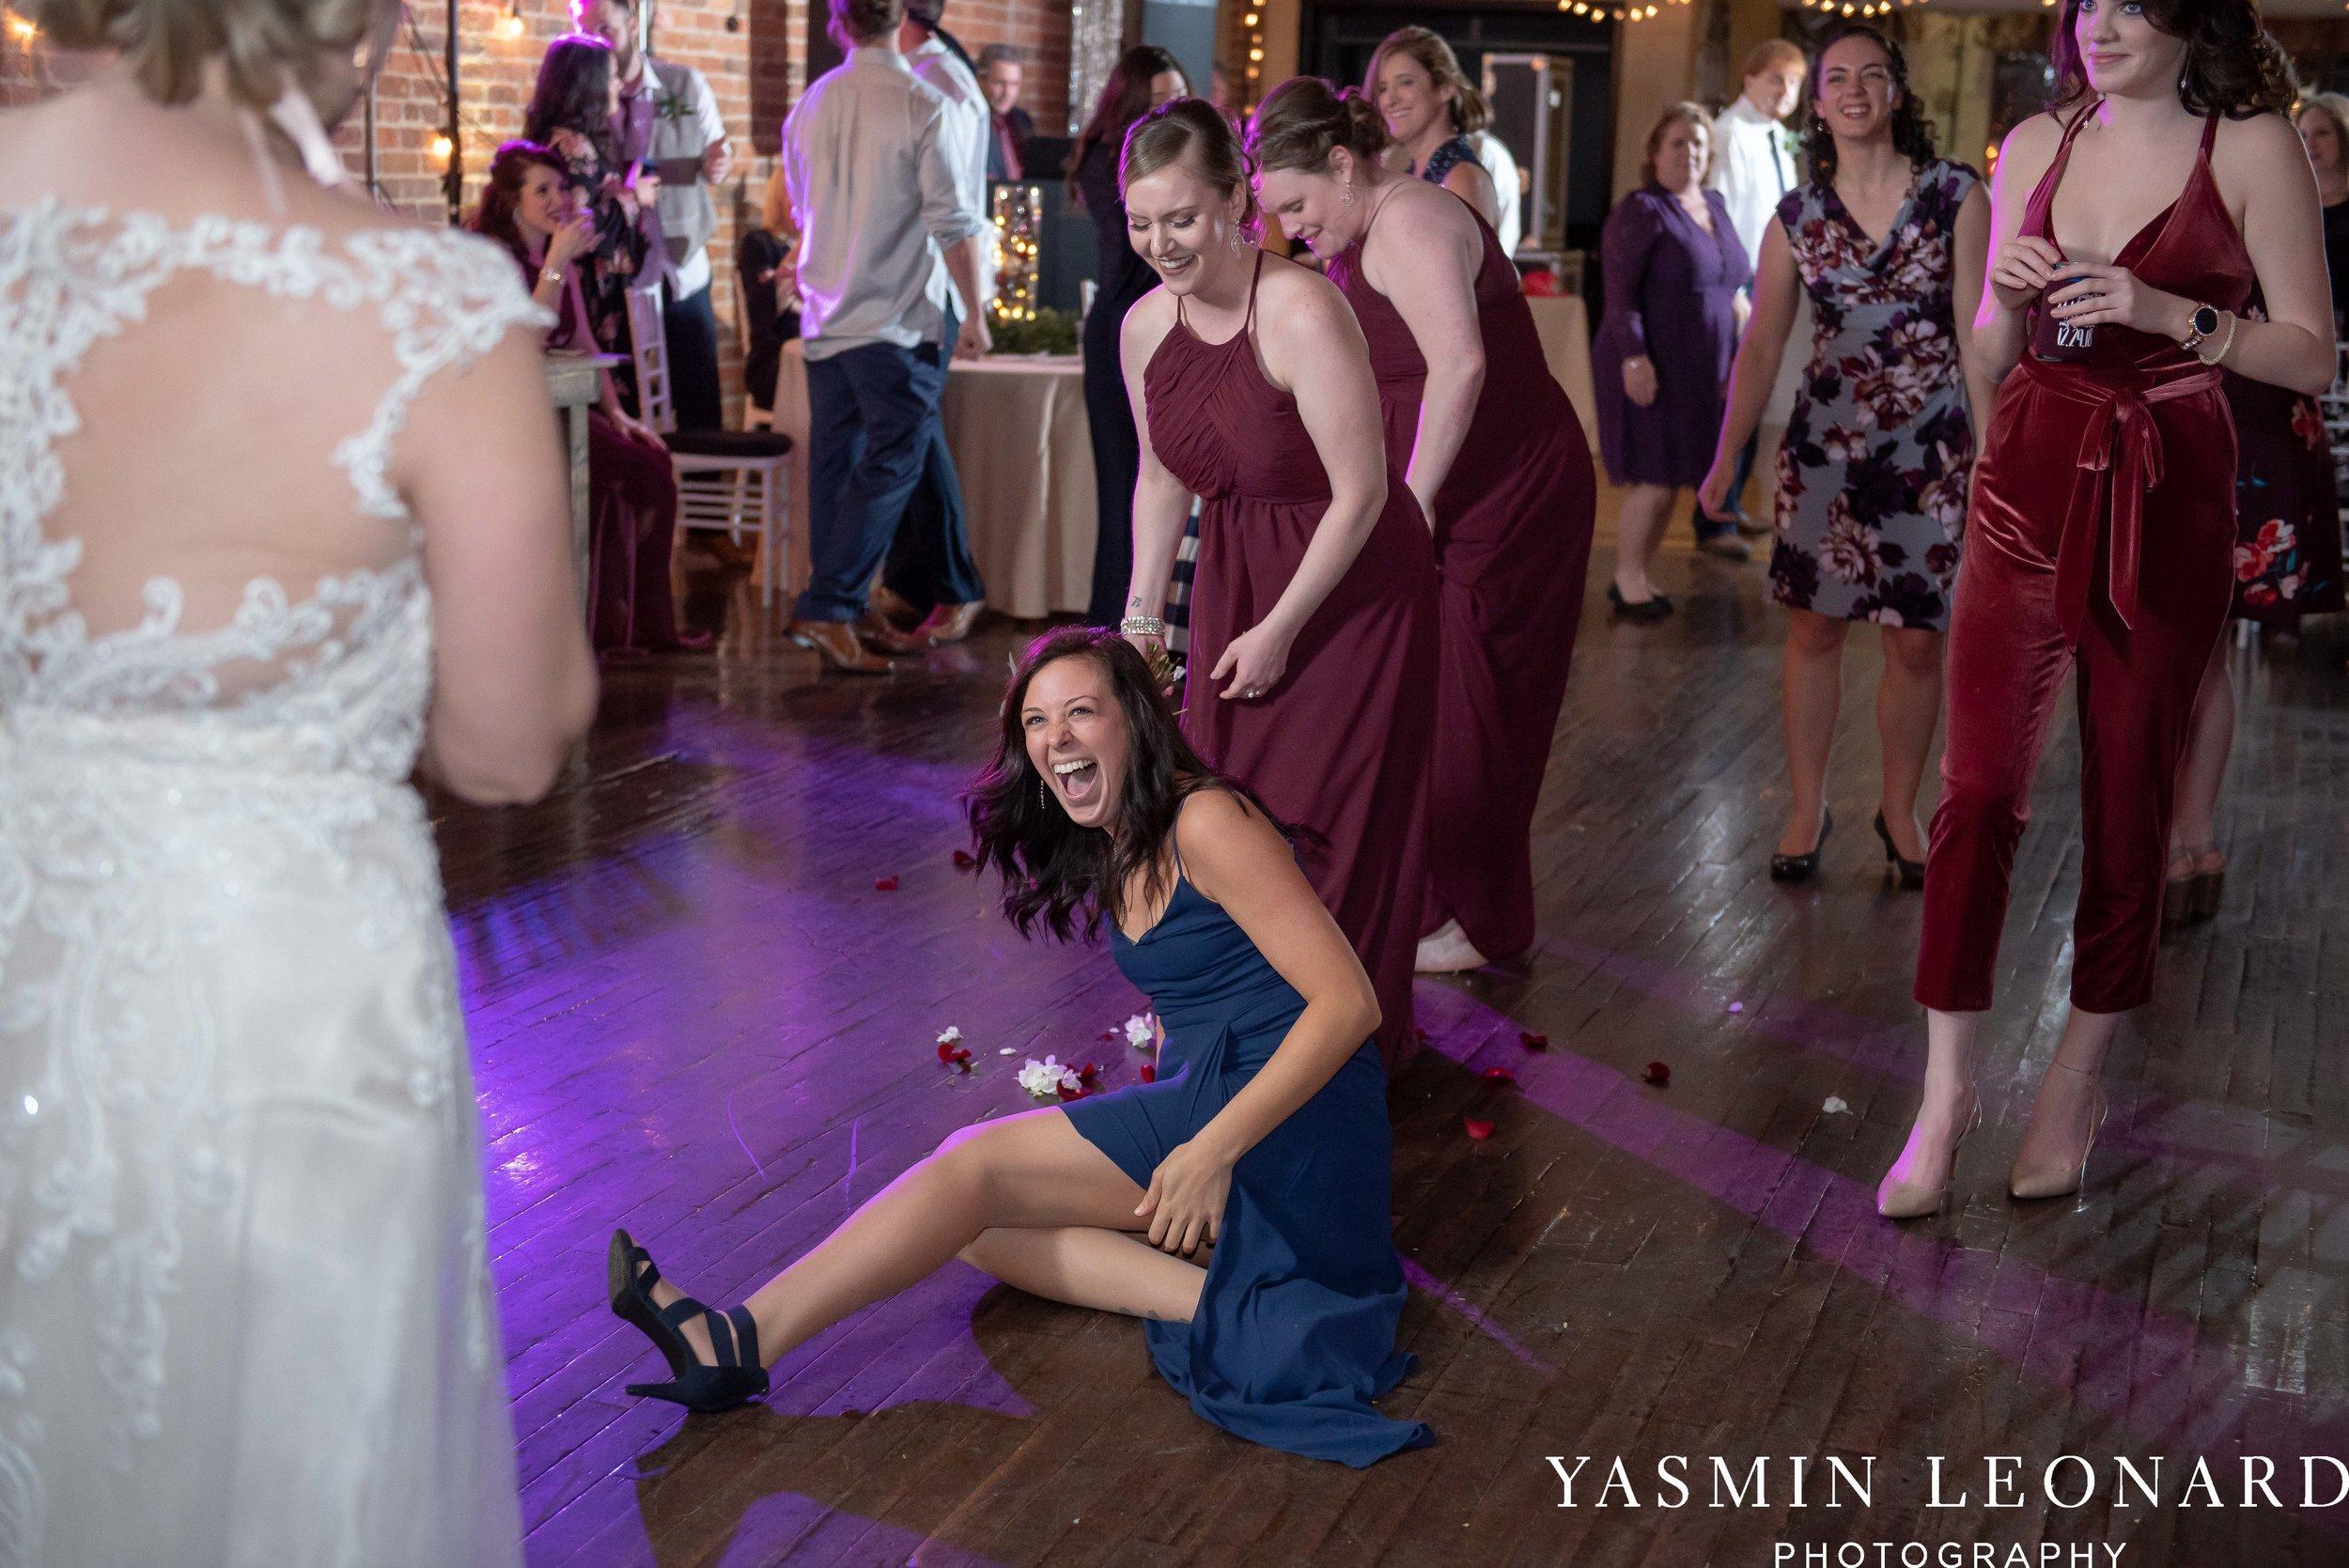 Rebekah and Matt - 105 Worth Event Centre - Yasmin Leonard Photography - Asheboro Wedding - NC Wedding - High Point Weddings - Triad Weddings - Winter Wedding-68.jpg